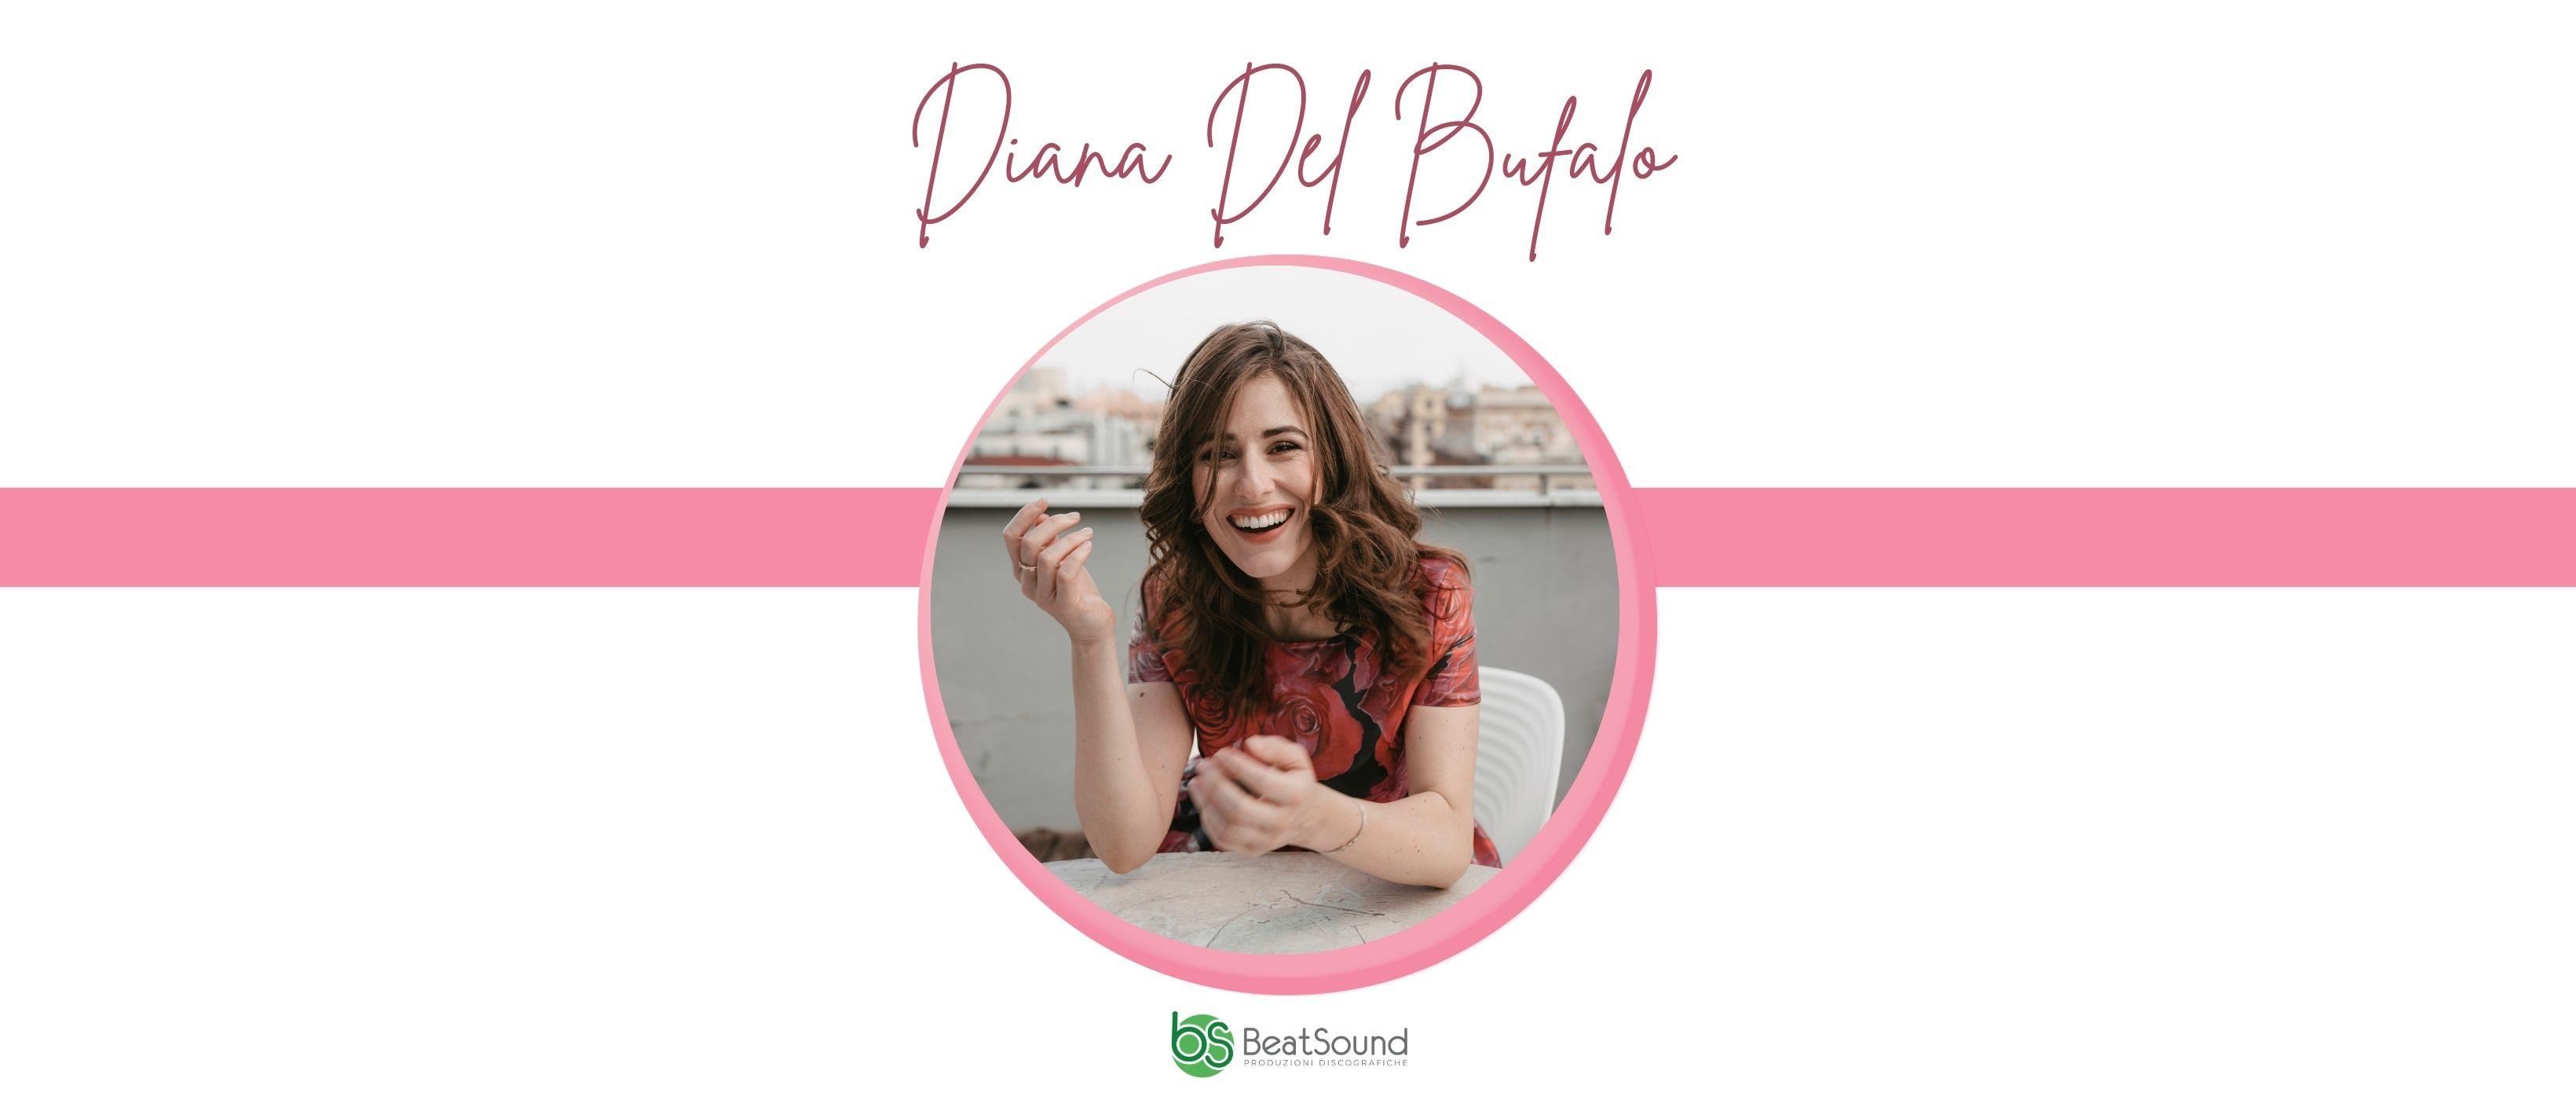 Diana Del Bufalo – Flashdance